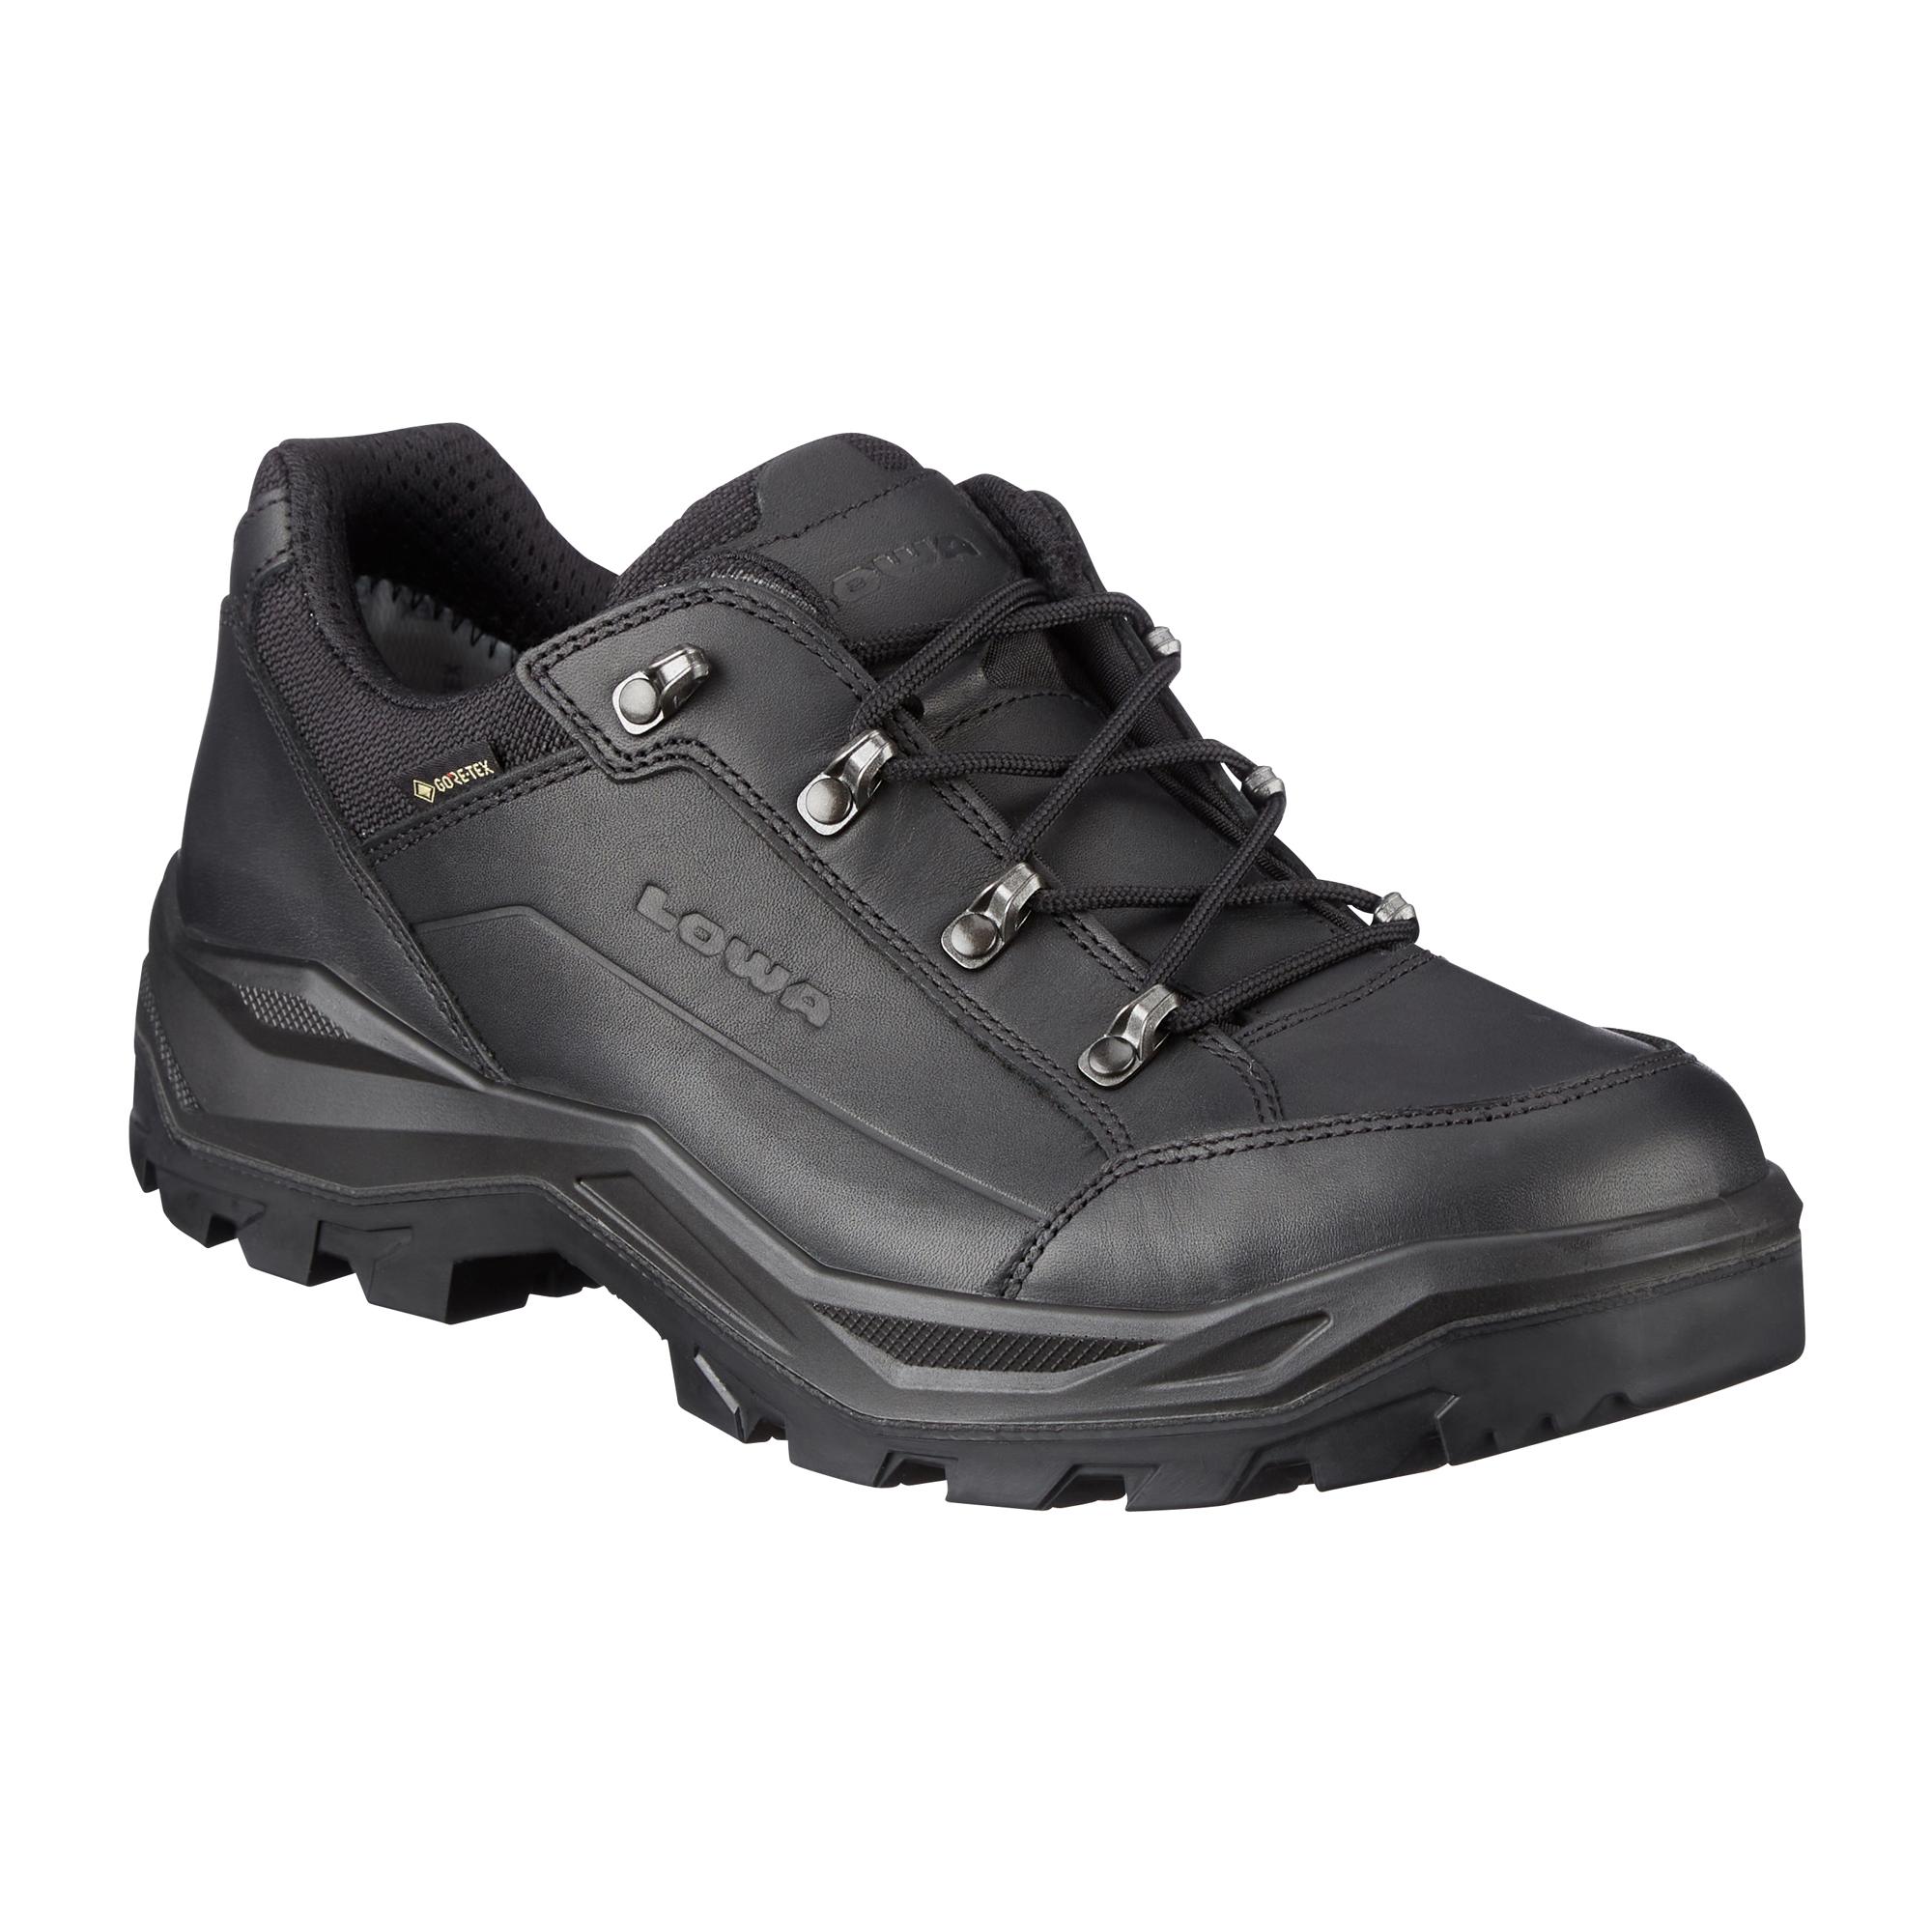 LOWA Schuhe Renegade II GTX LO TF schwarz